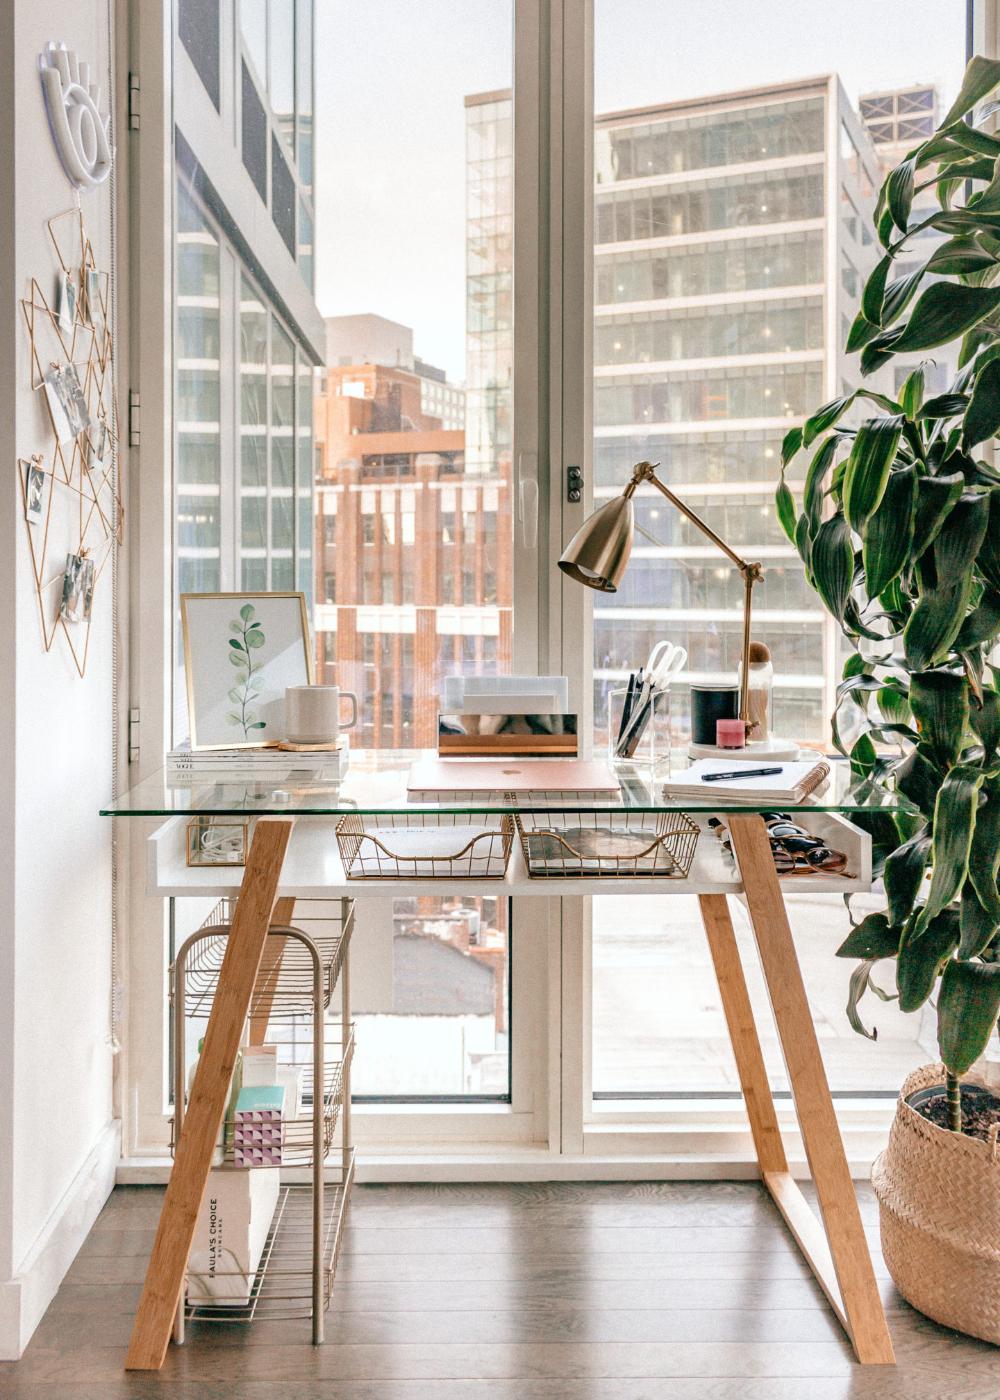 My Desk | Organization + Decor - Melissa Frusco